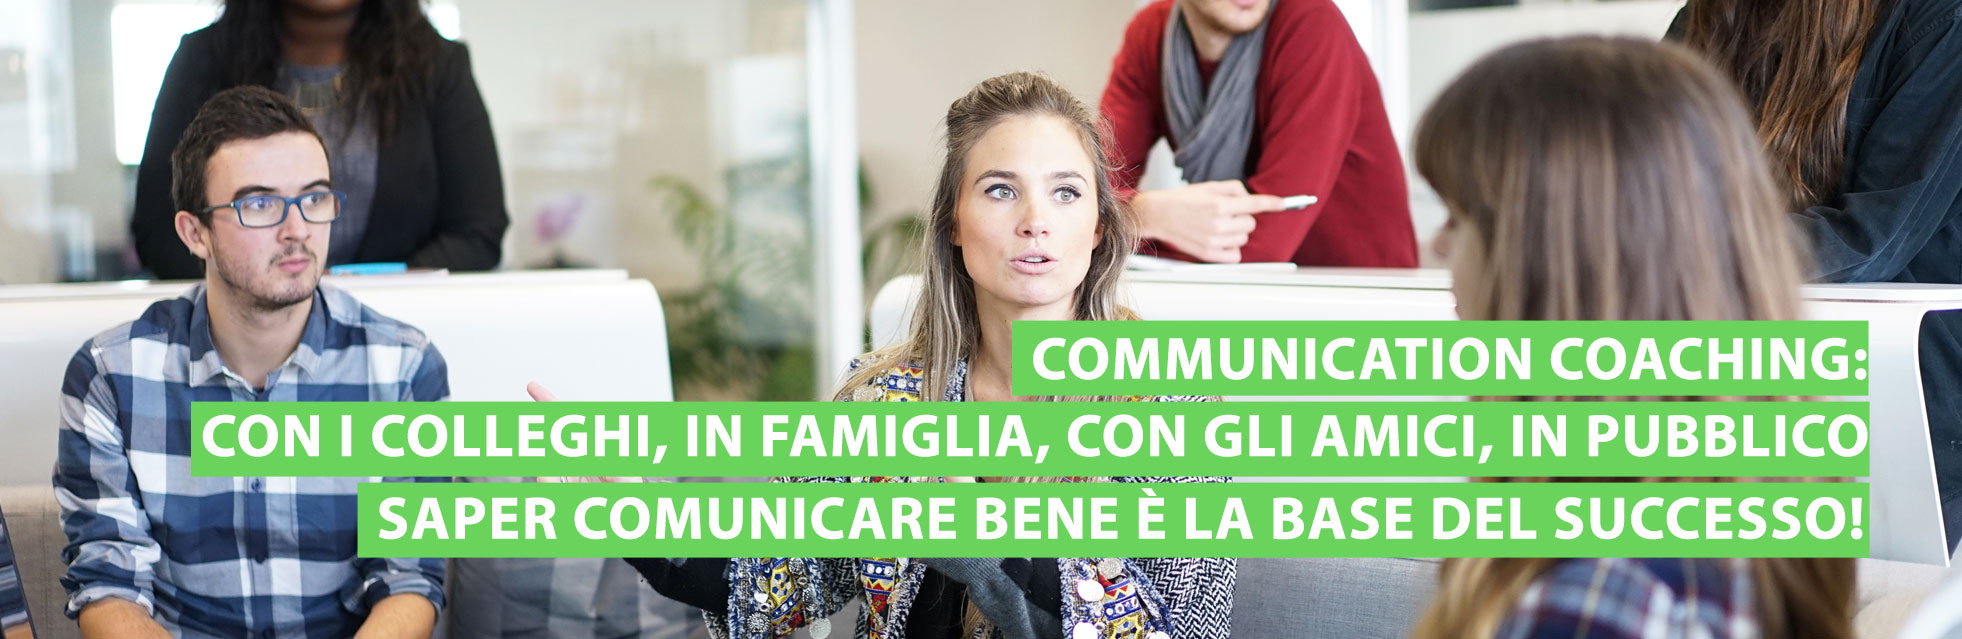 communication-coaching-impara-come-comunicare-bene-ed-efficacemente